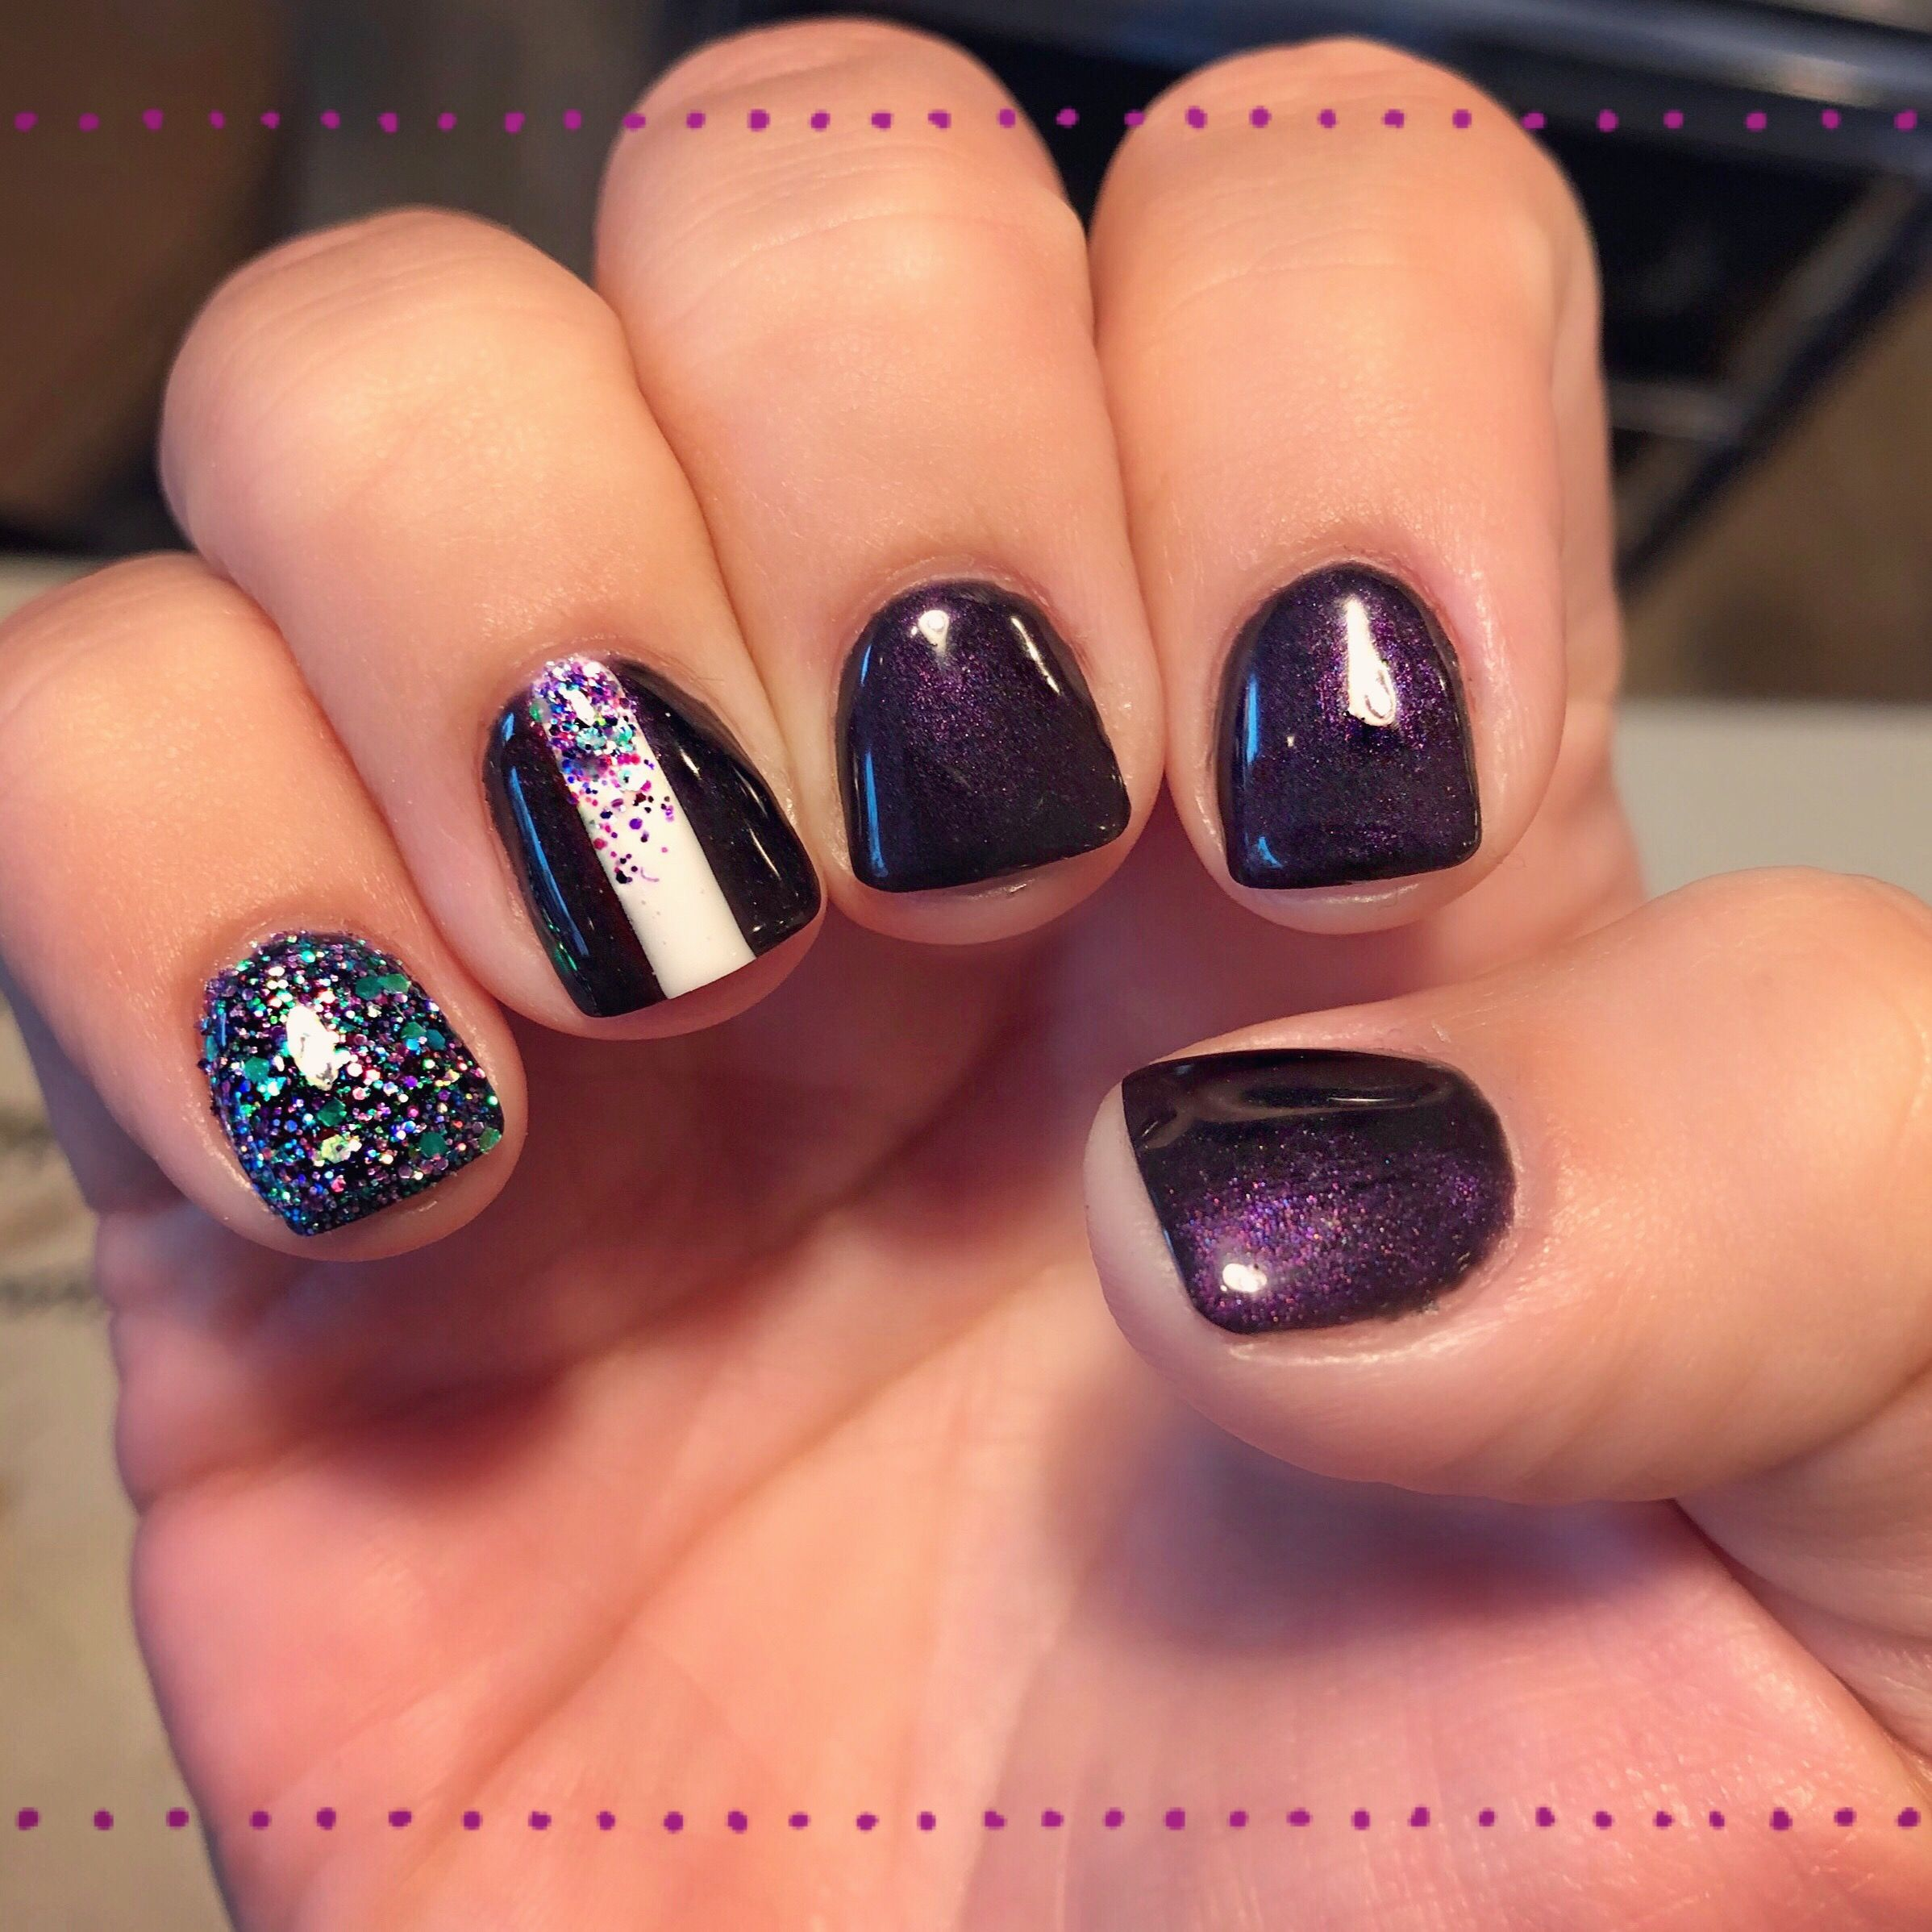 Dark purple glitter nail art gel manicure | Nail art | Pinterest ...